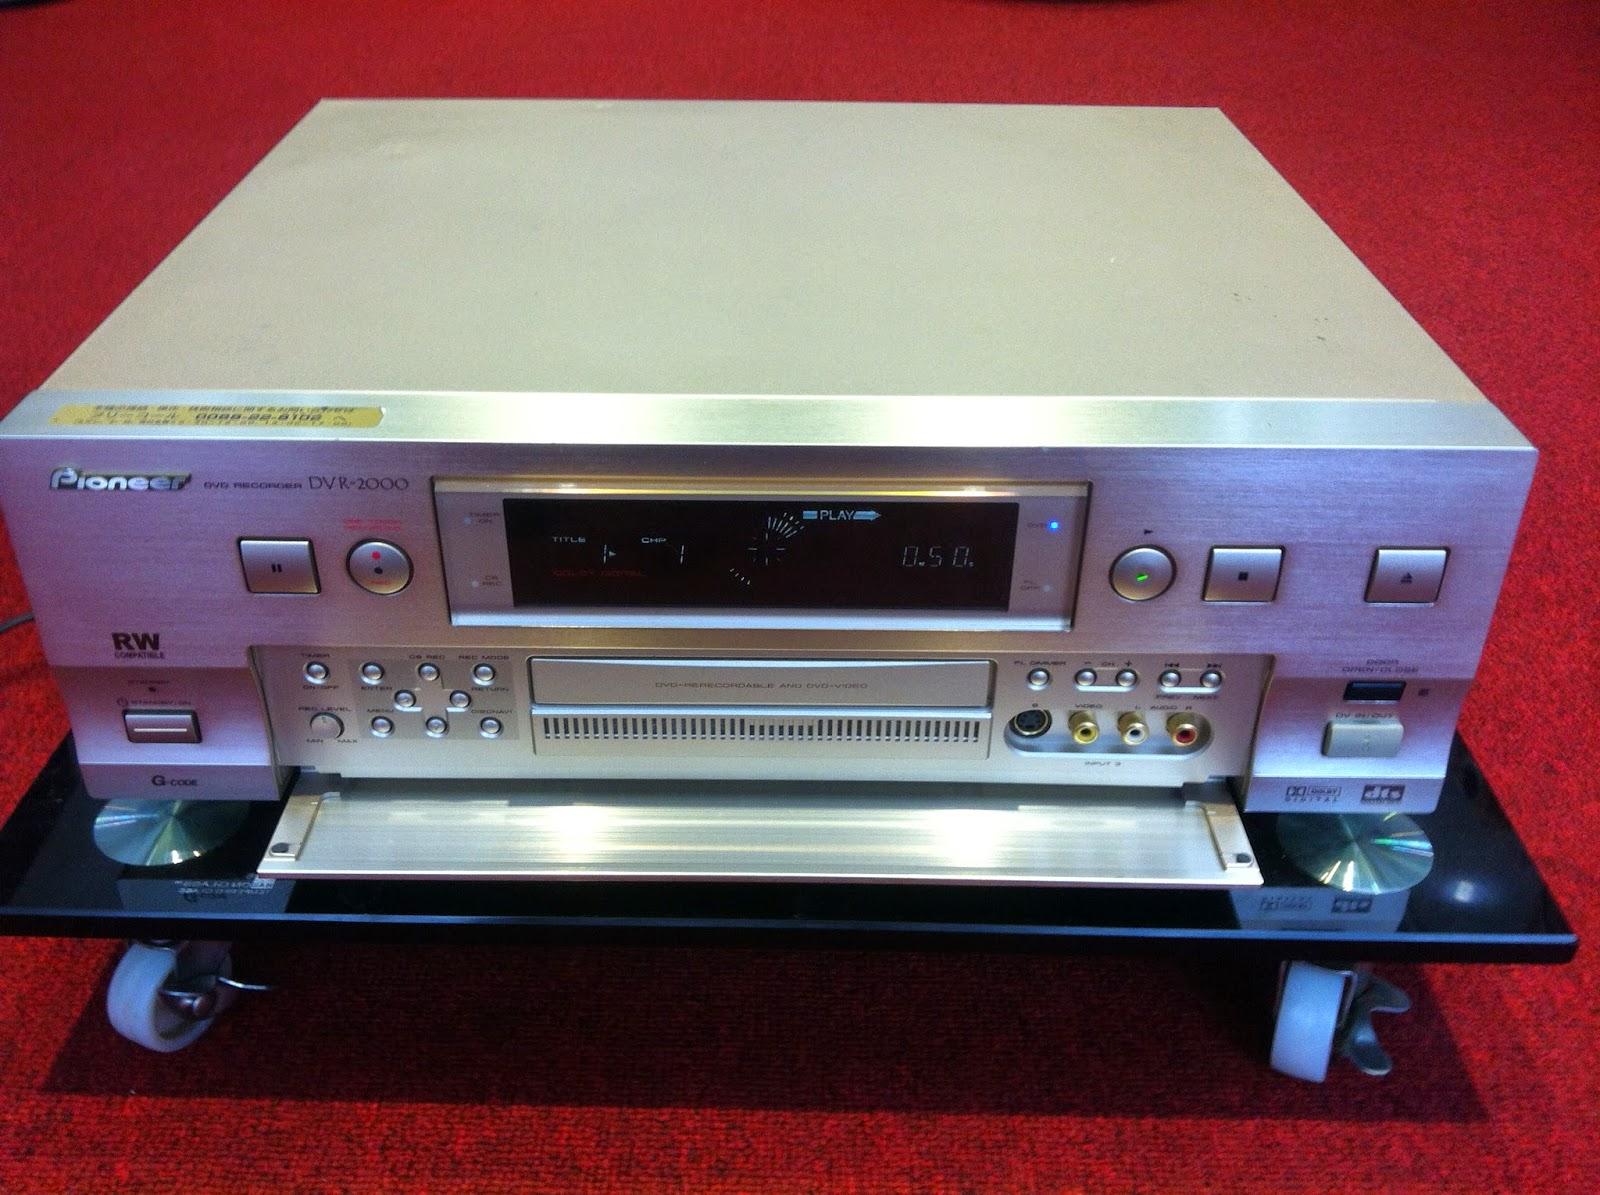 Đầu DVD Recorder - DVR-2000 - Made in Japan